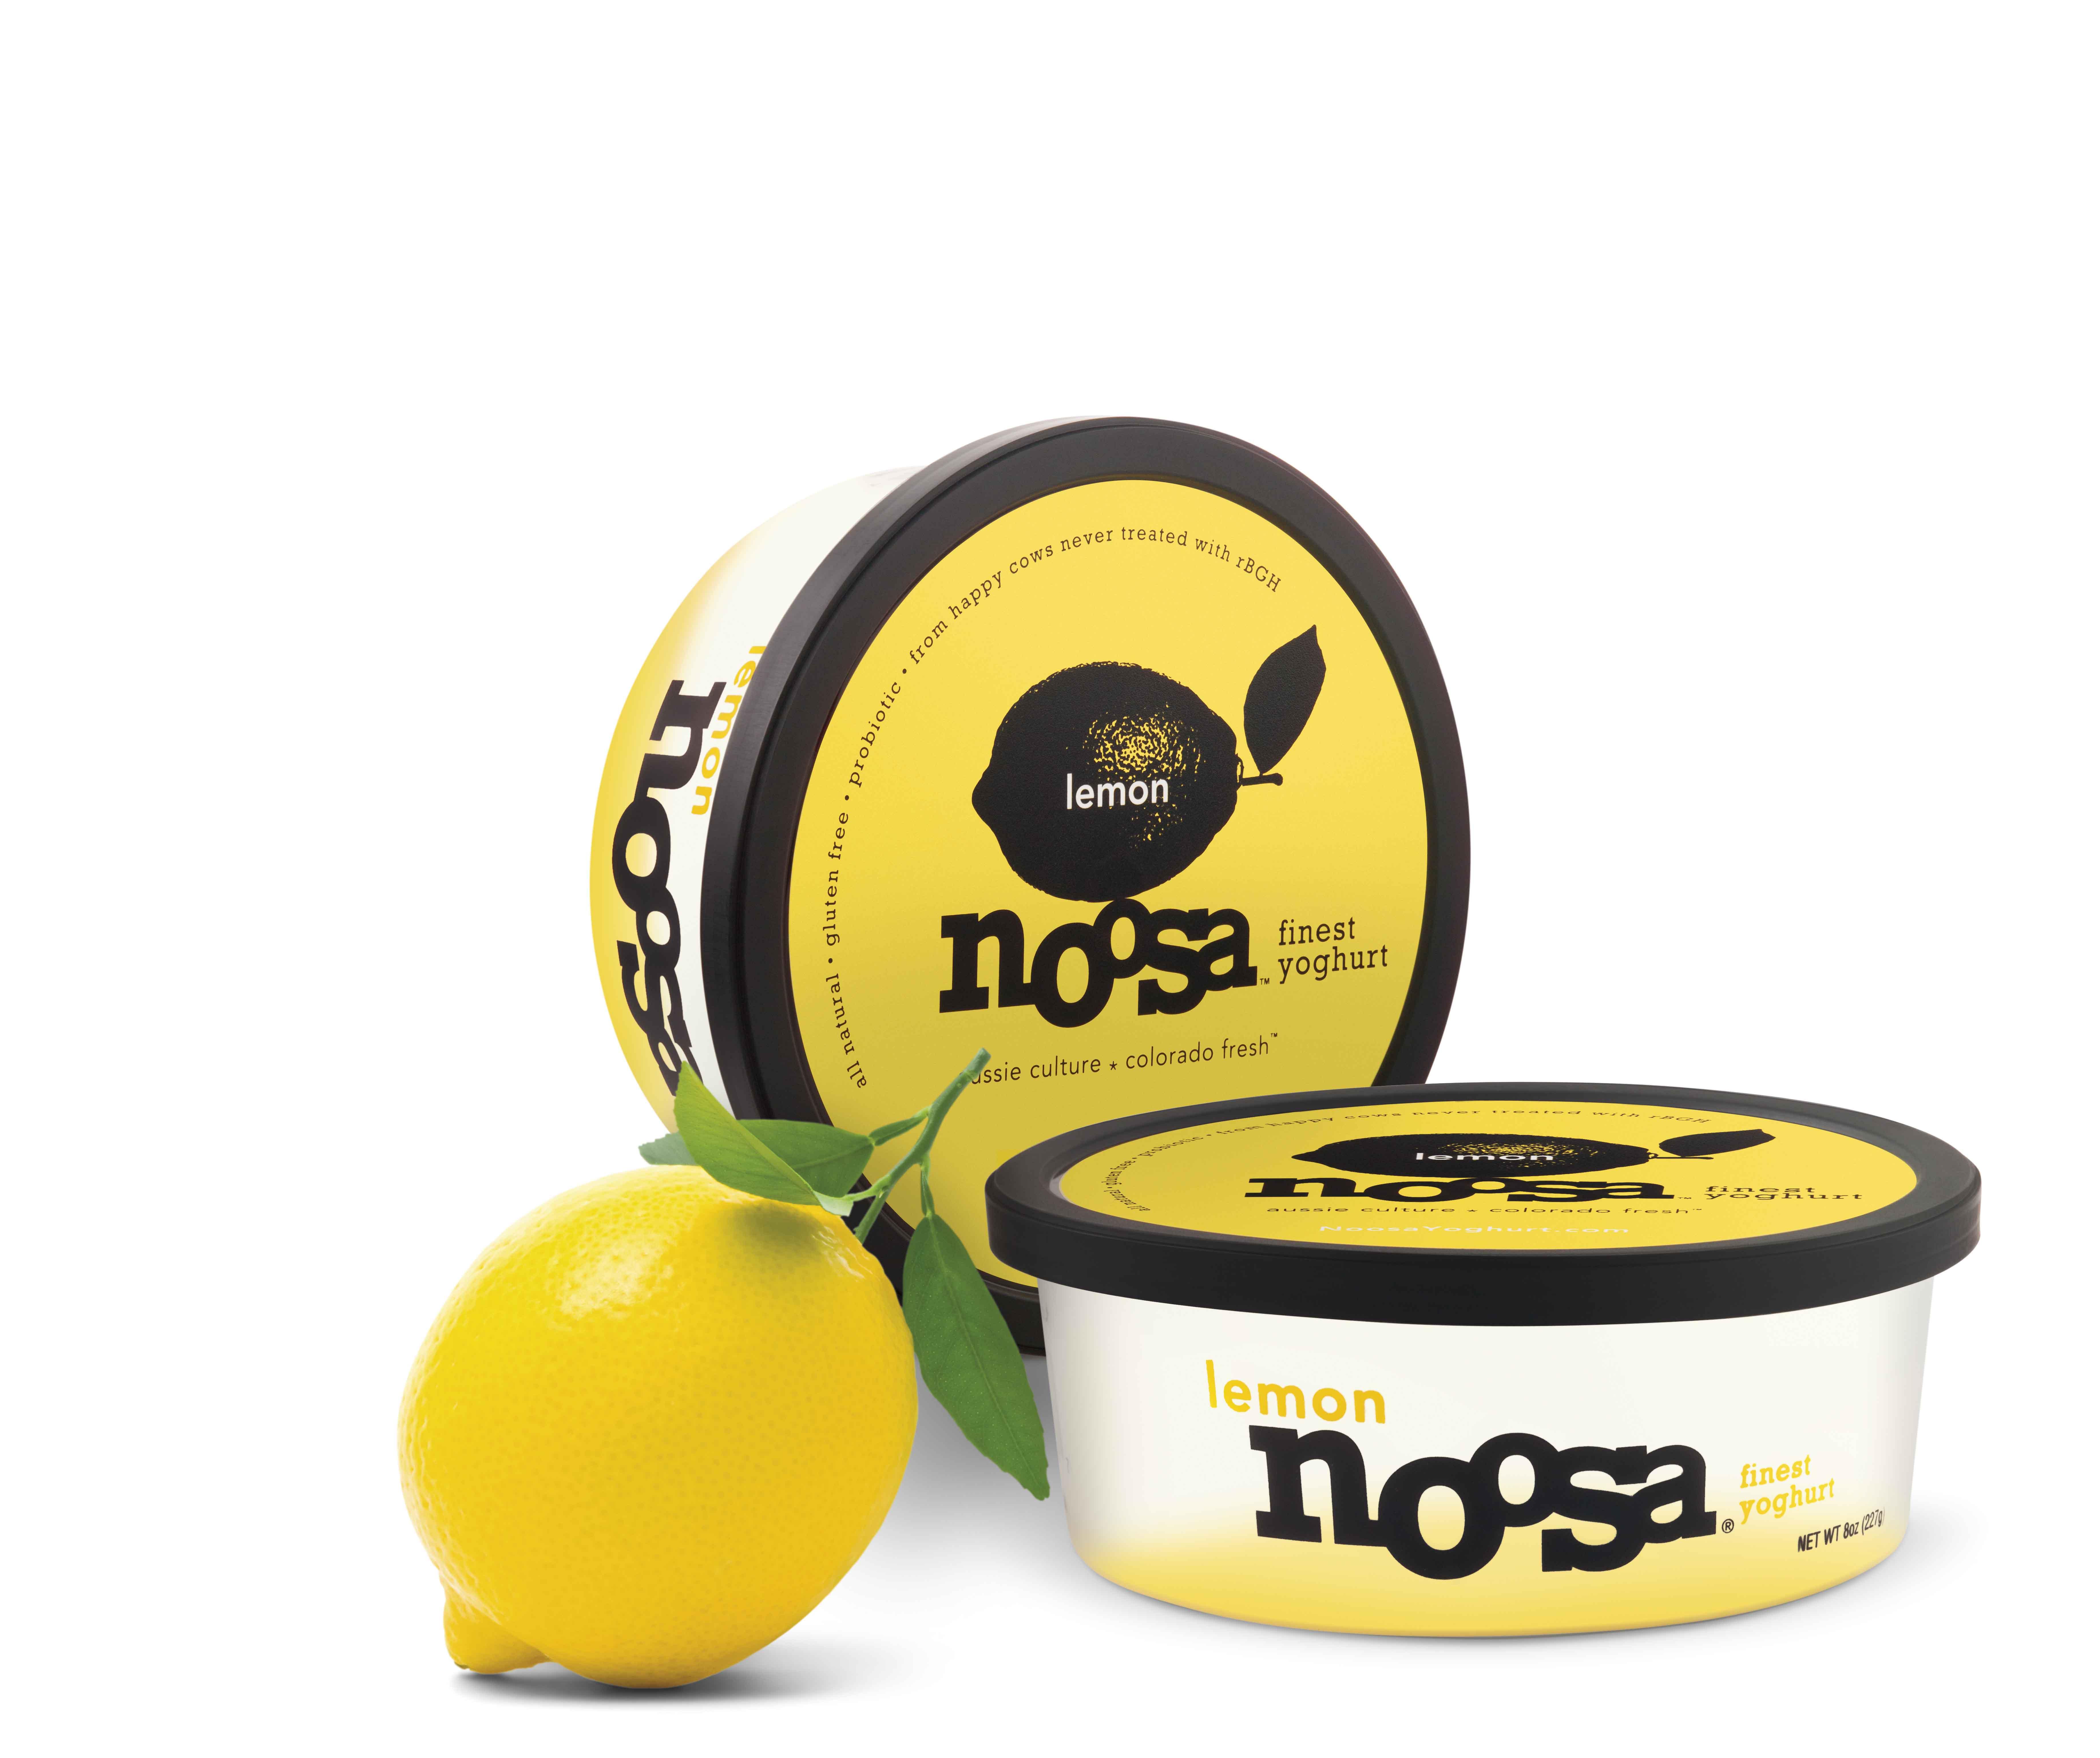 noosa yoghurt lemon